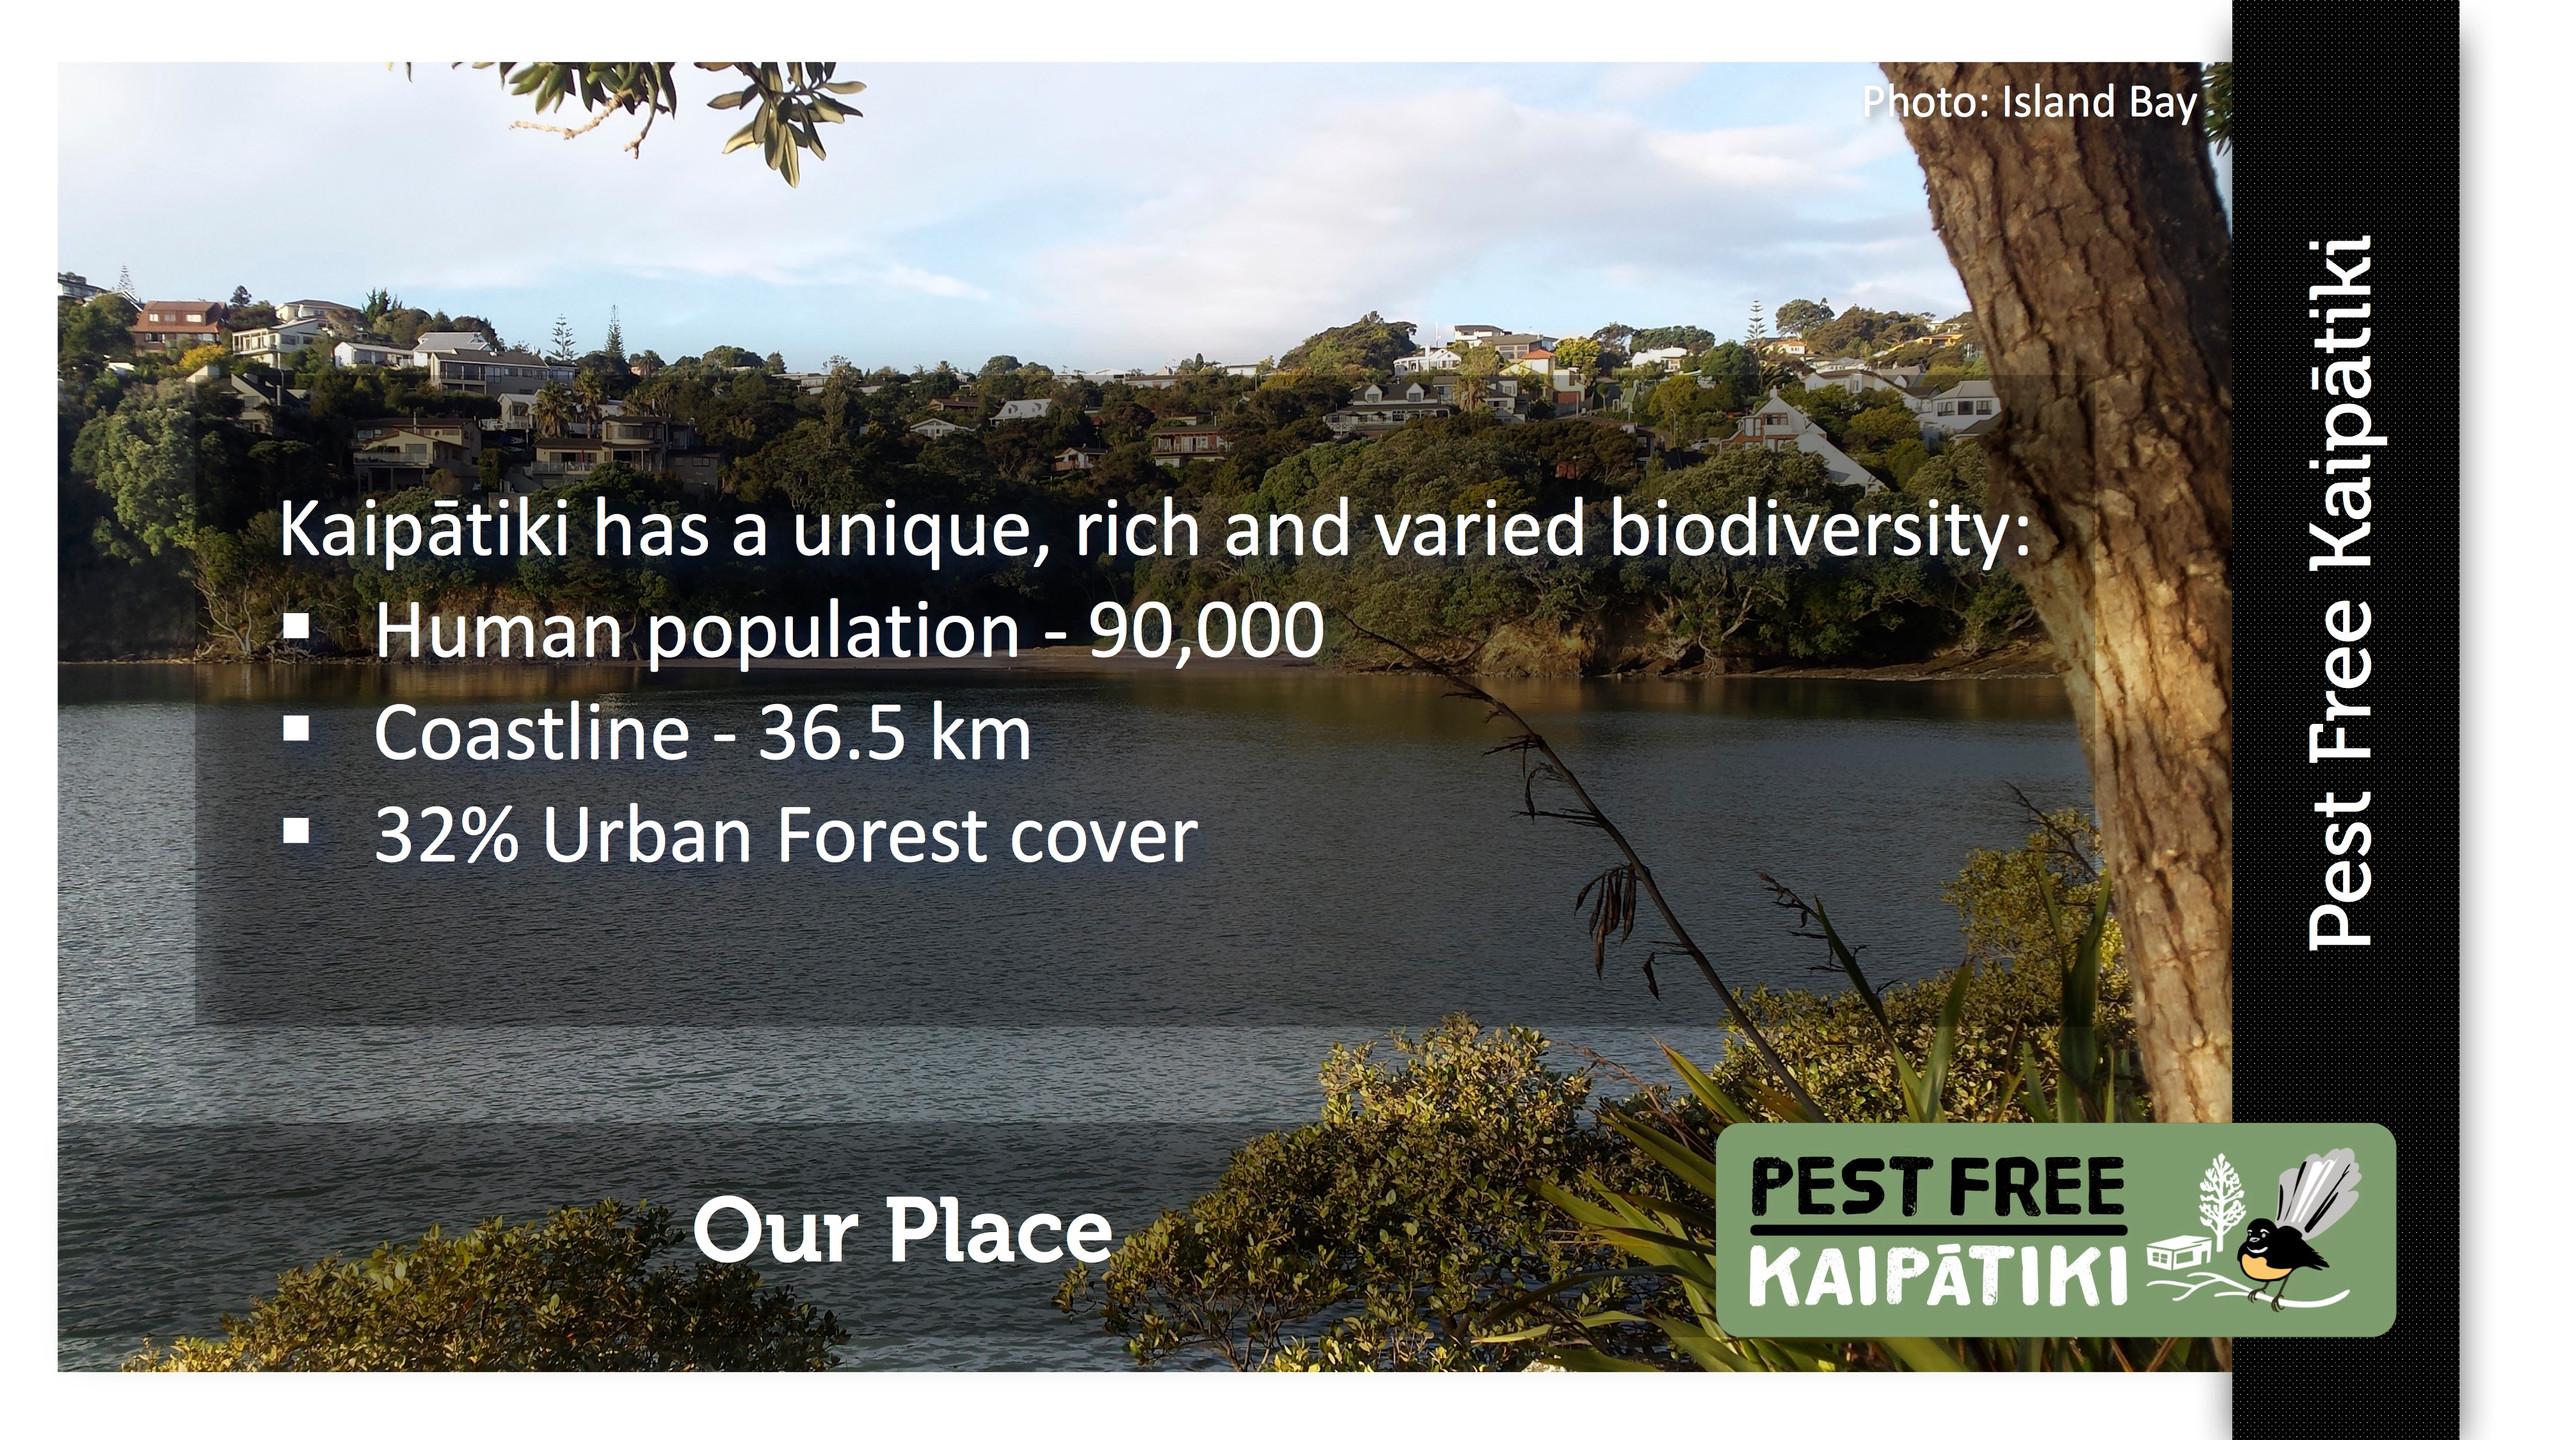 Pest Free Kaipatiki-Pestival-slide7